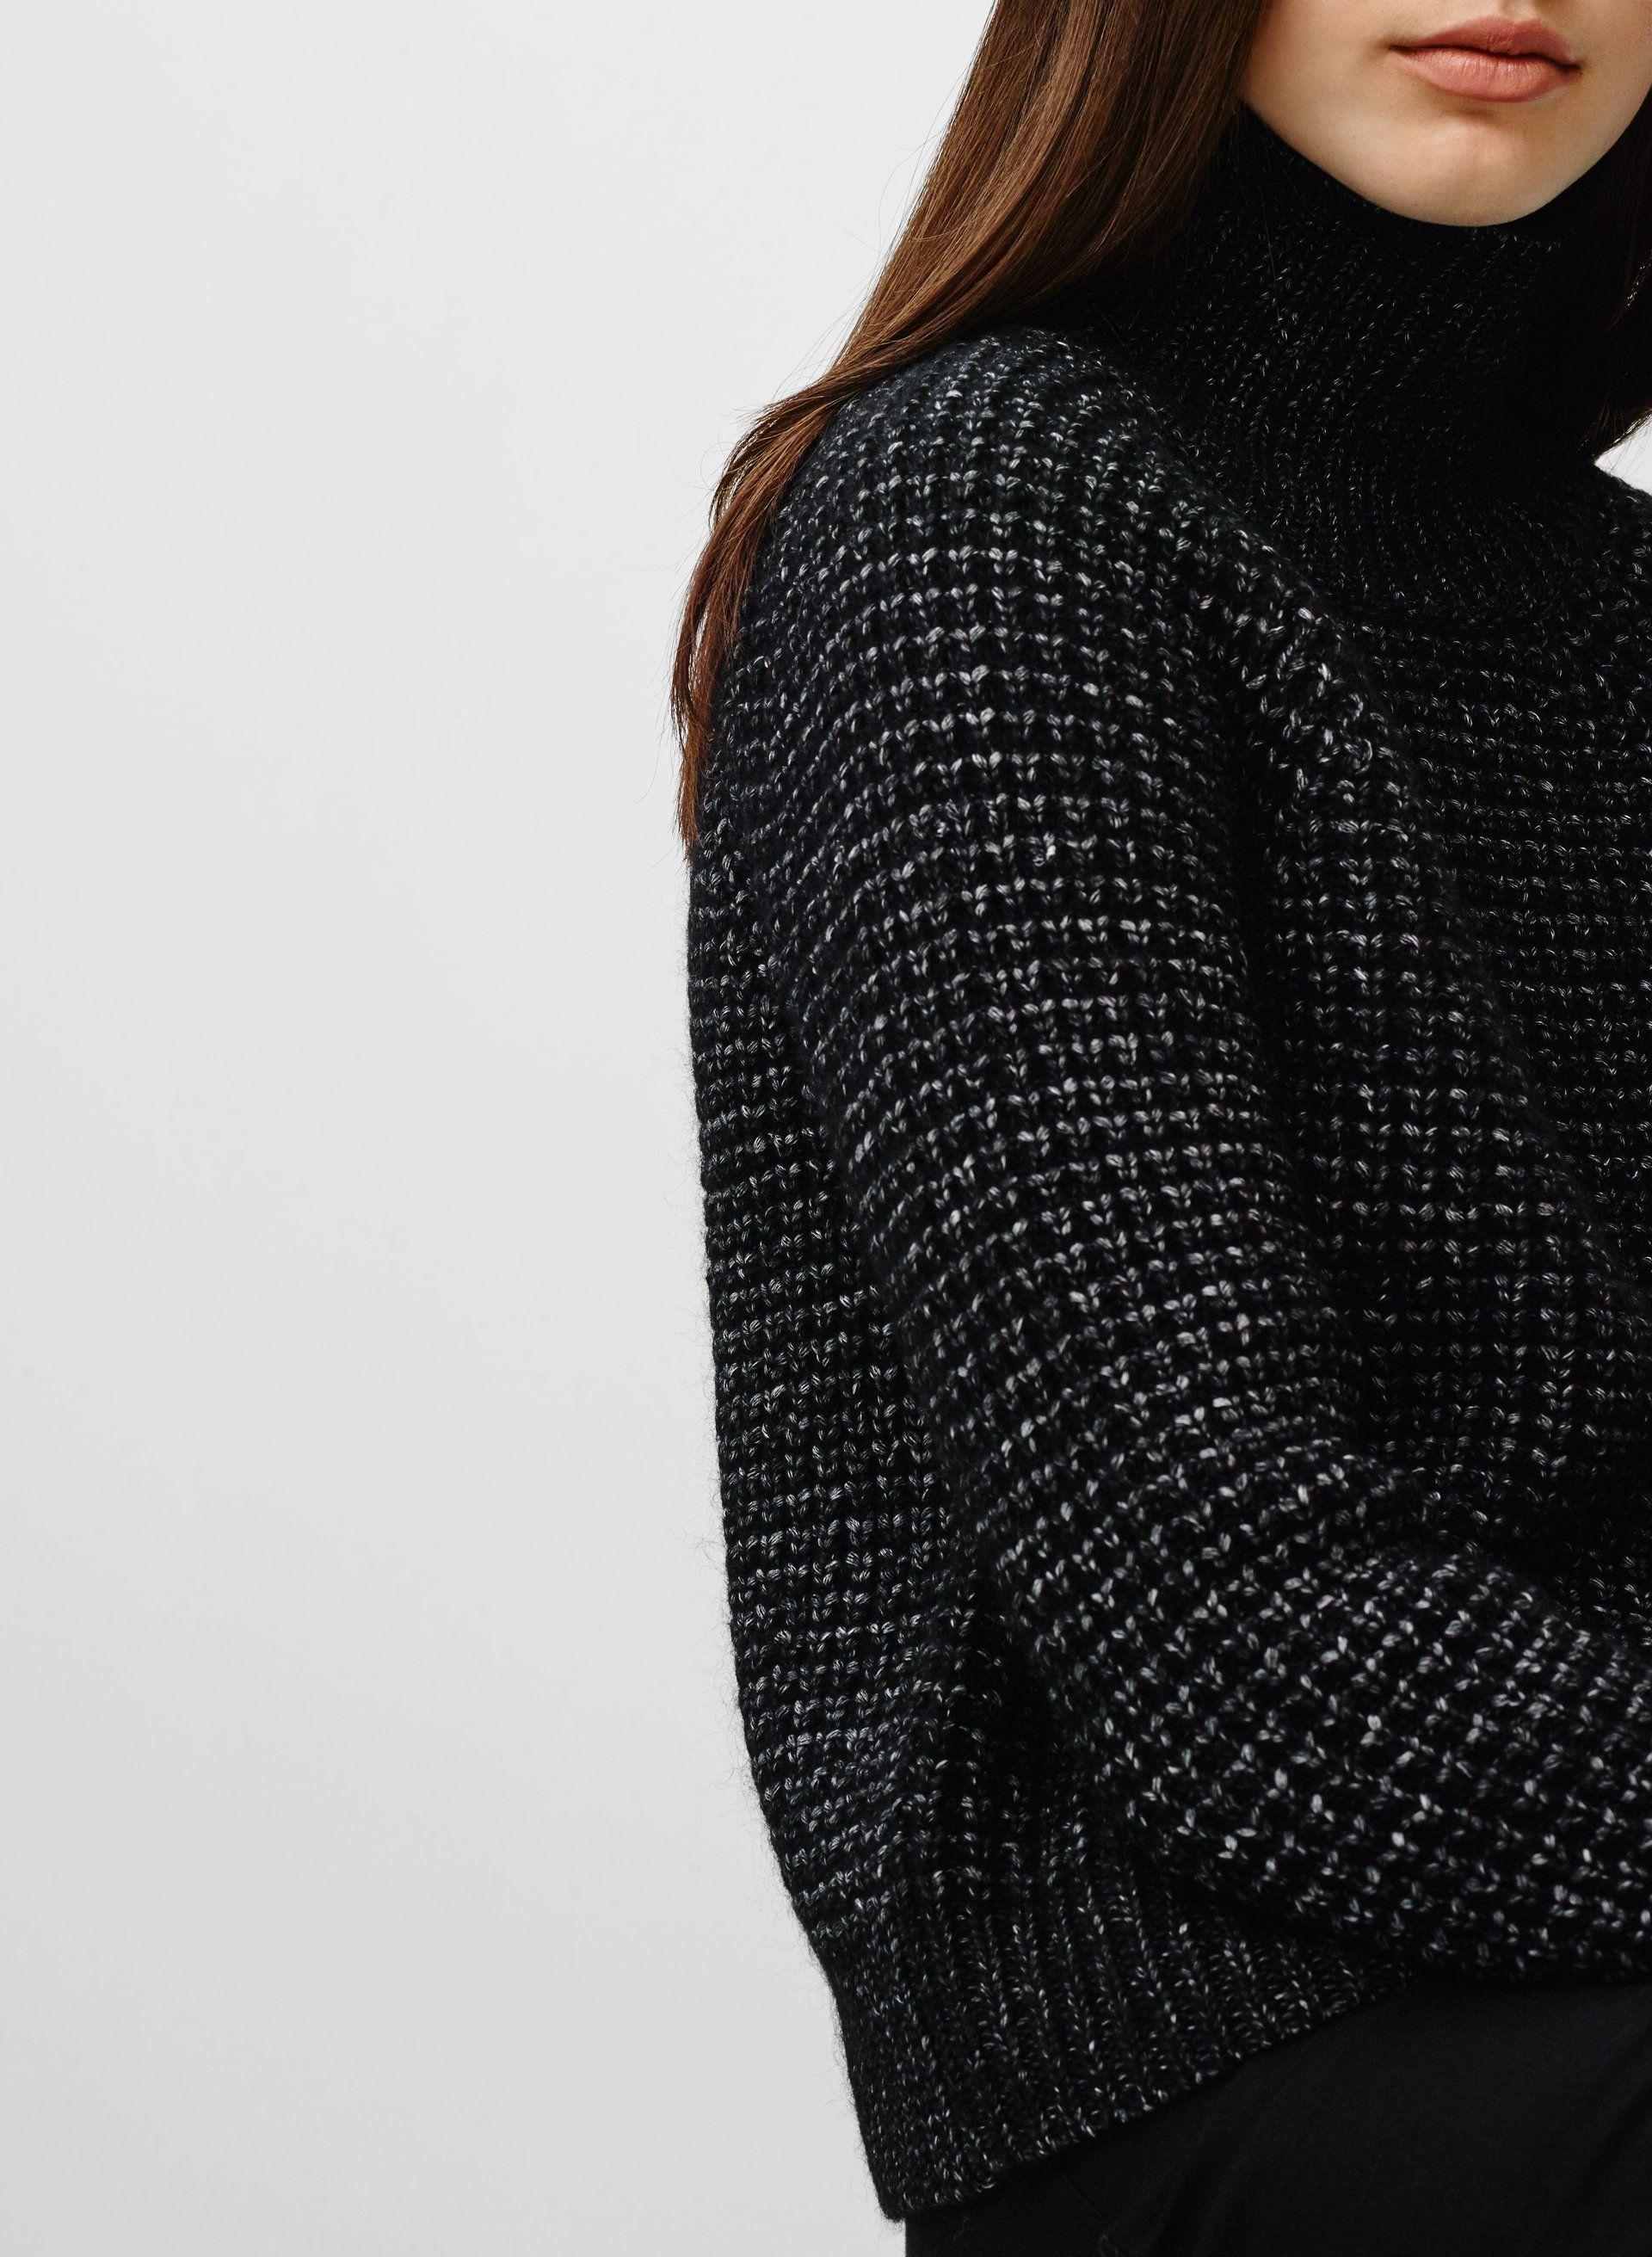 Leclerc sweater | Fall winter, Winter and Winter fashion